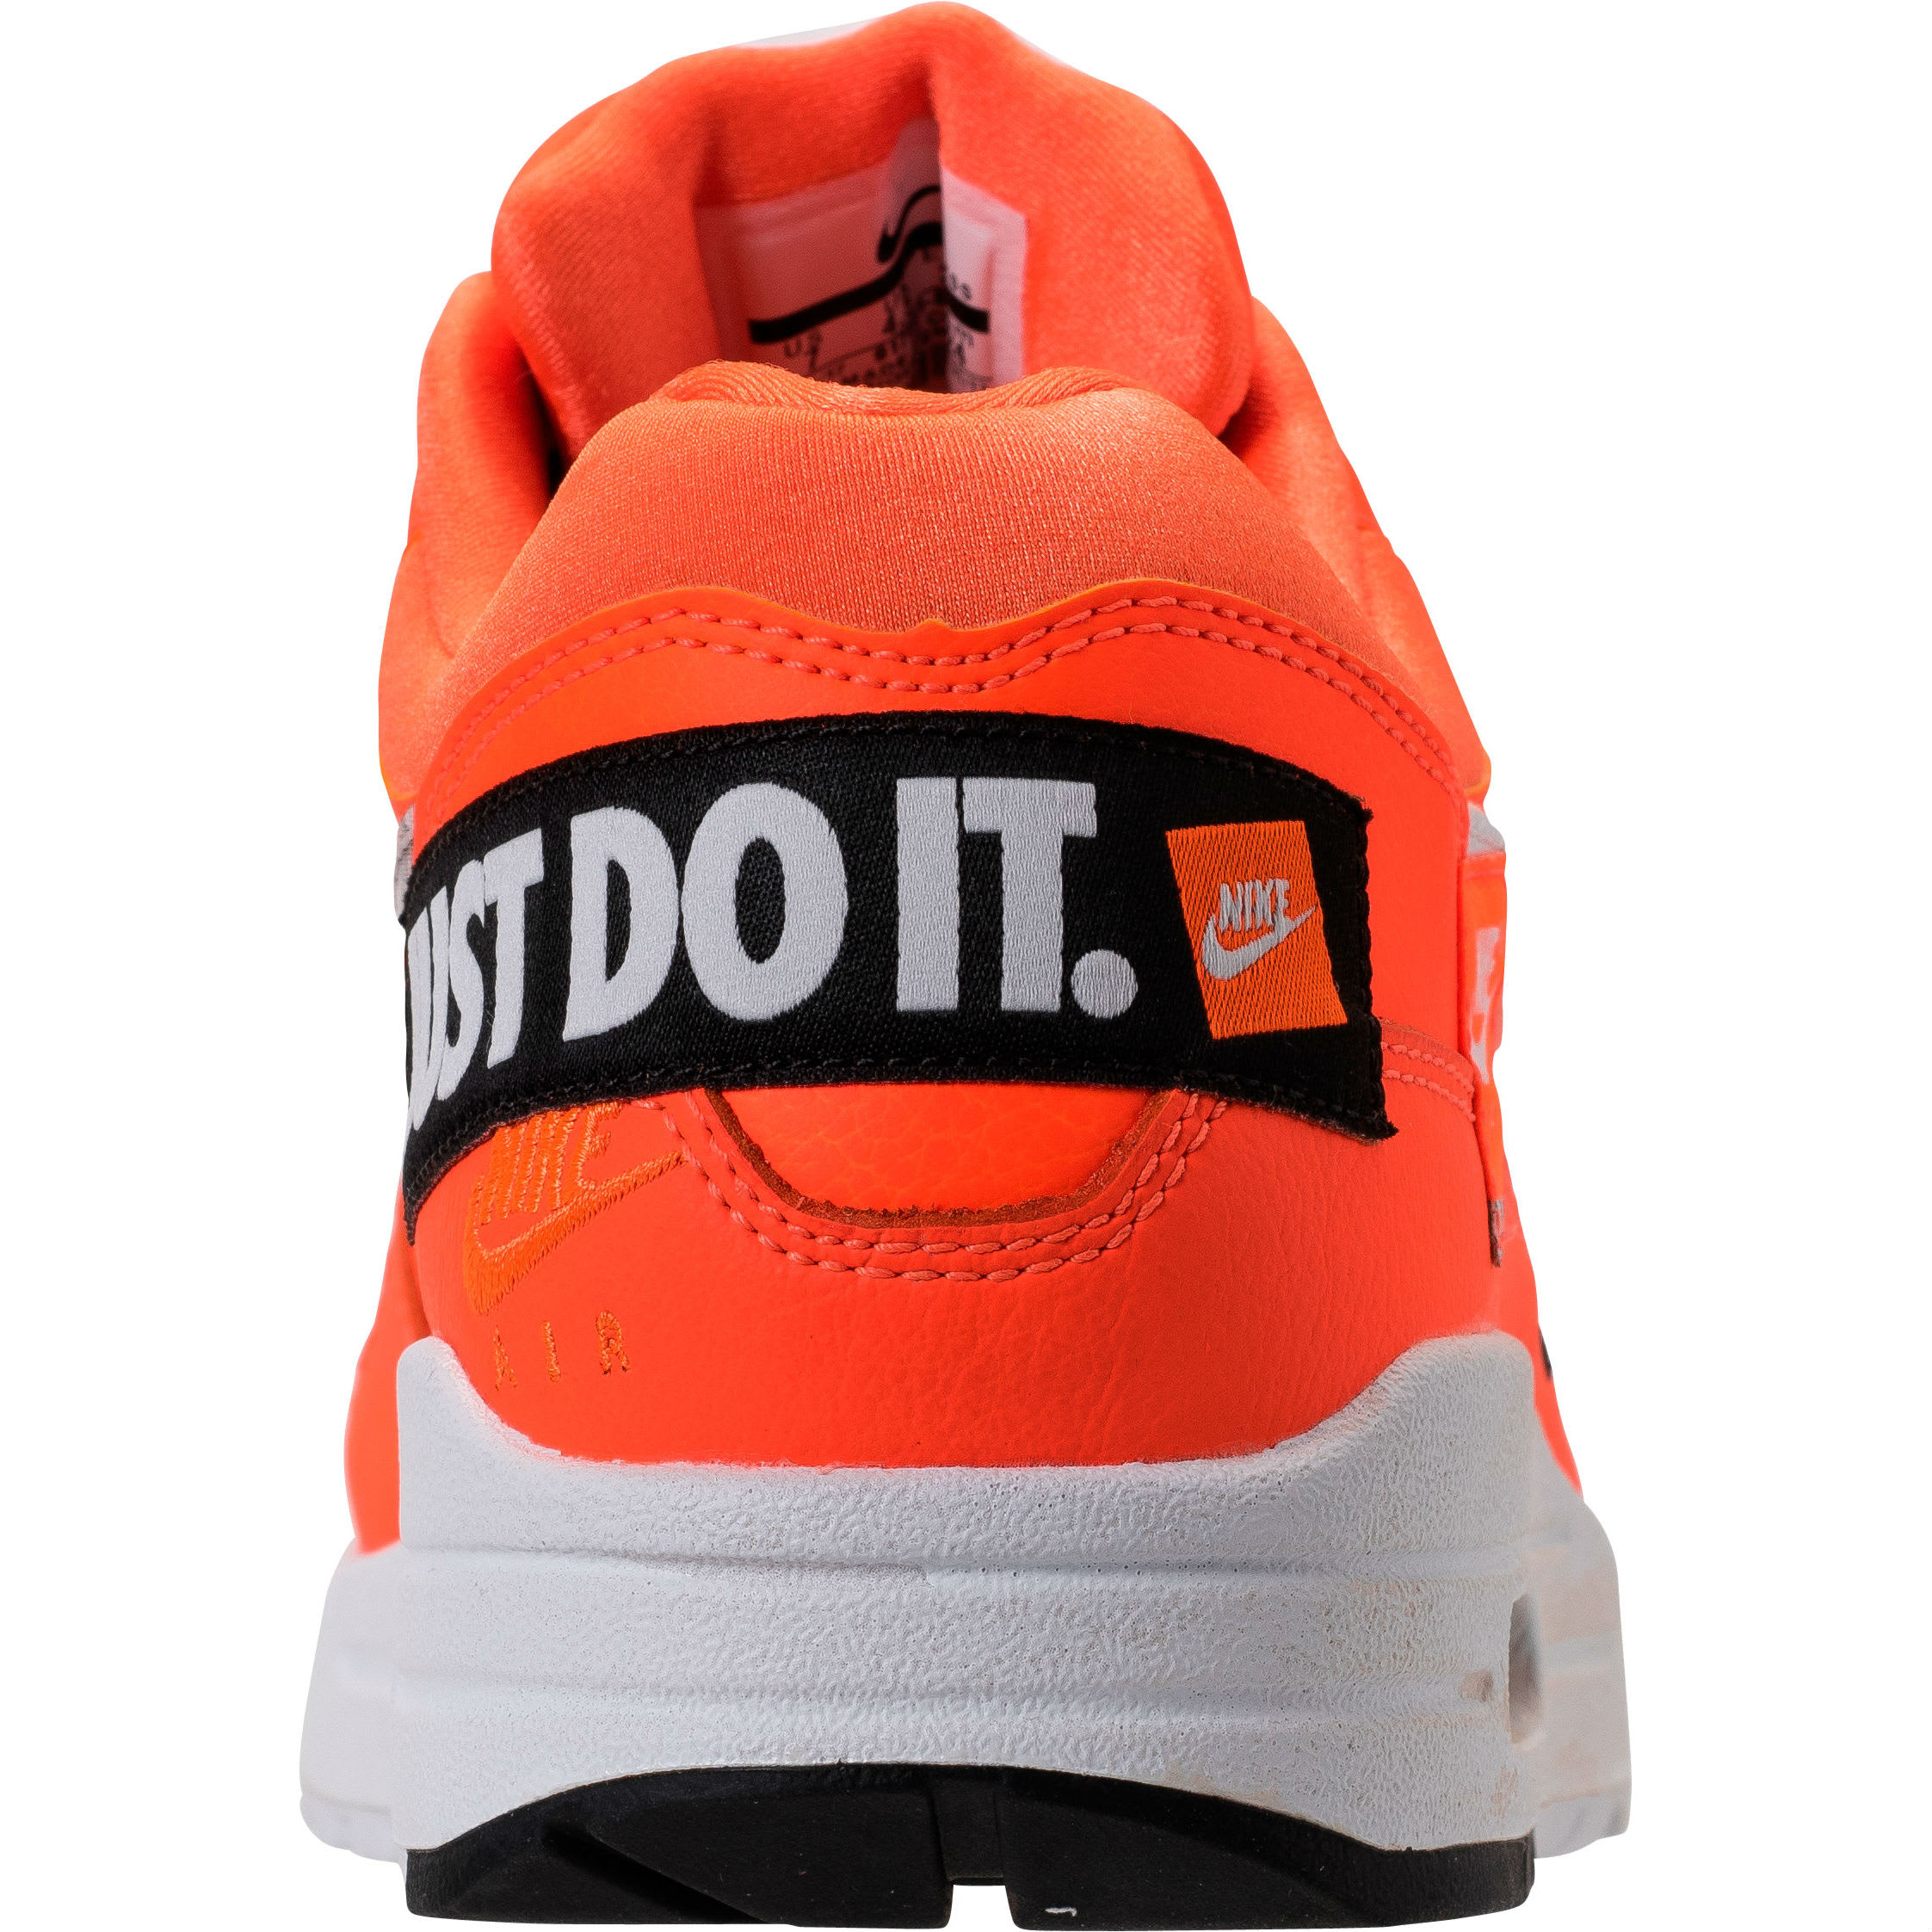 Nike Air Max 1 Just Do It Orange Release Date 917691-800 Heel